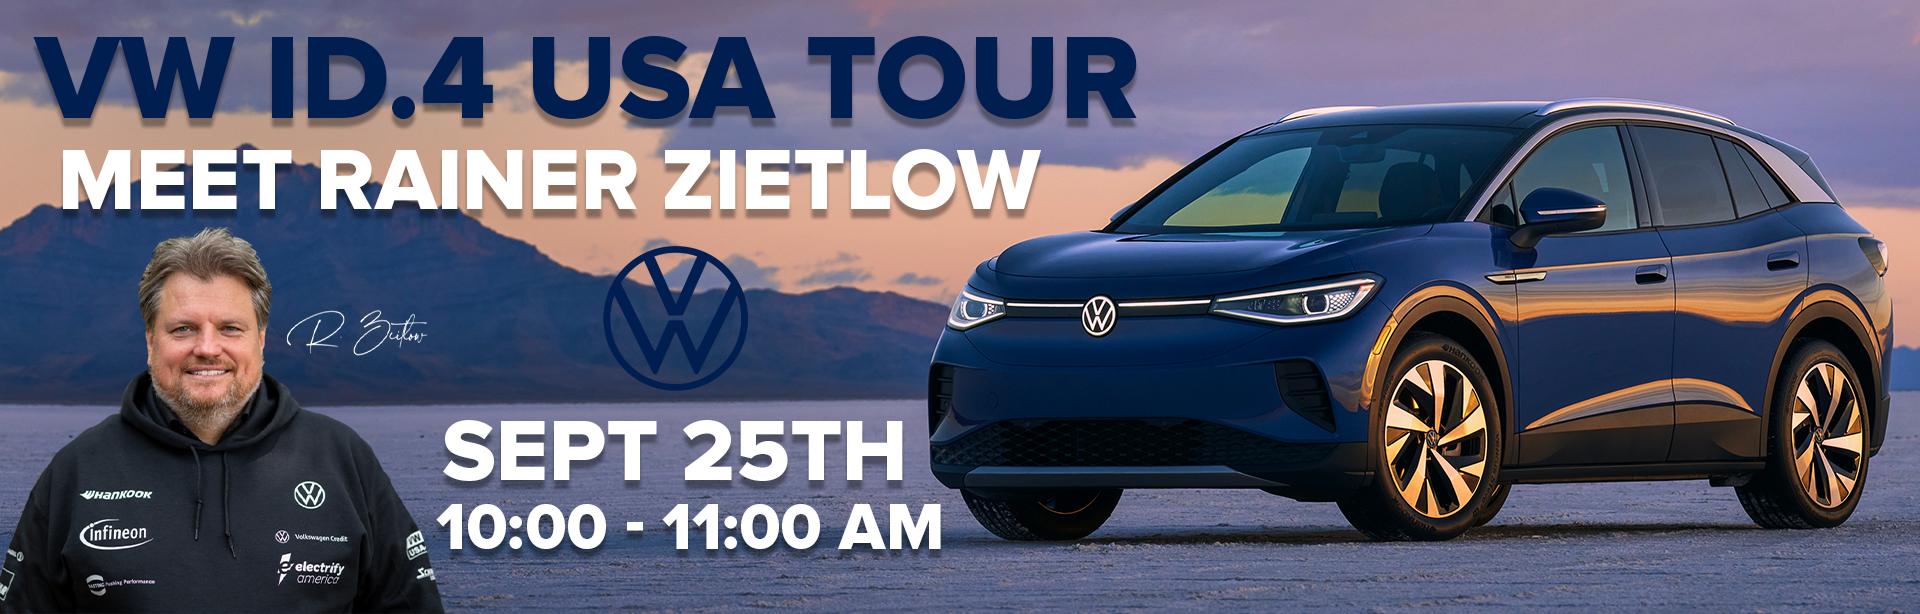 VW ID.4 USA-Tour